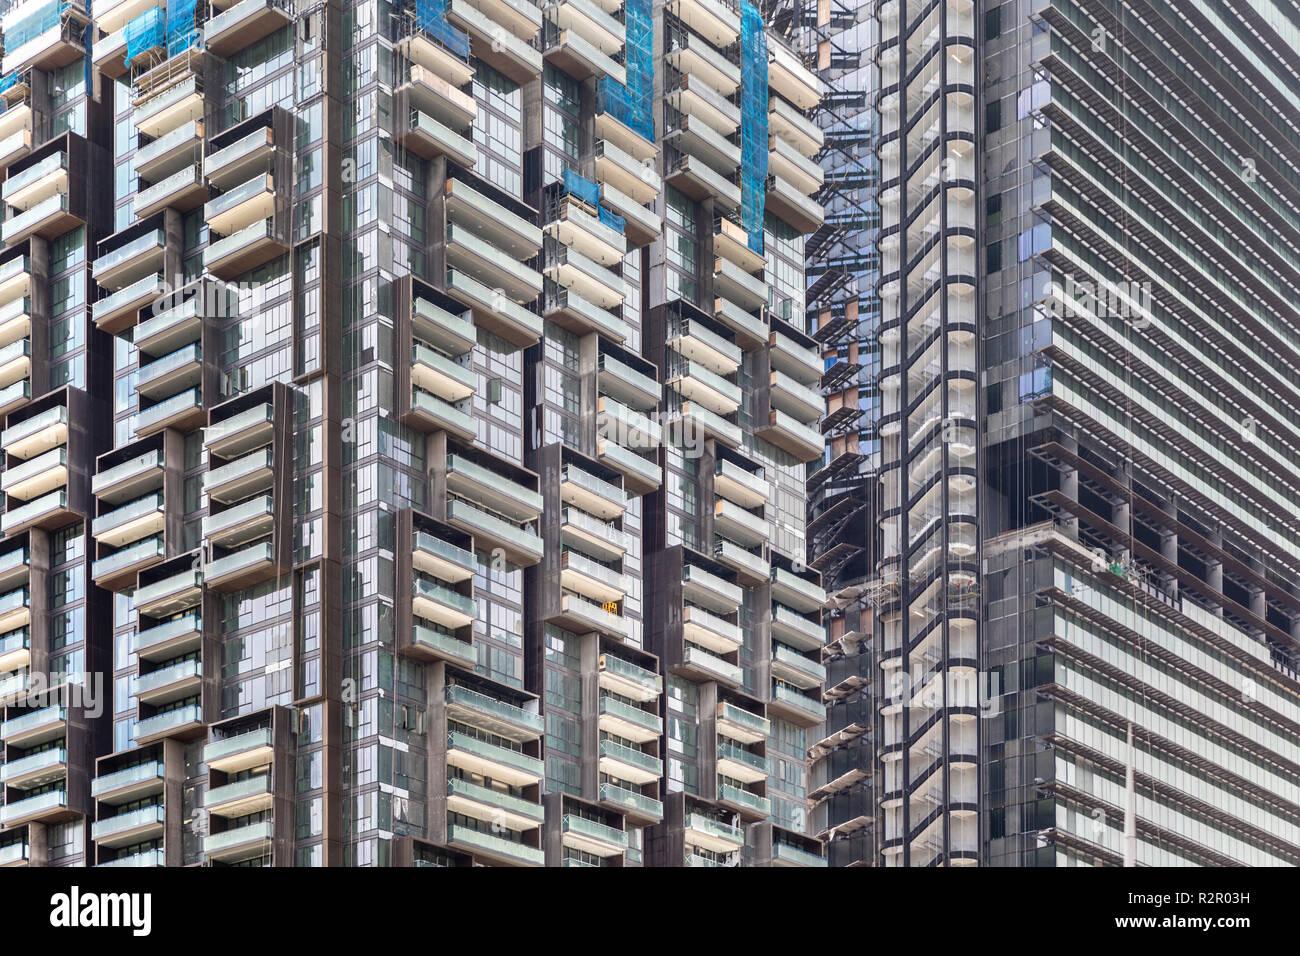 Singapur Hochhaus Fassaden Glas Balkon Treppe Stockfoto Bild